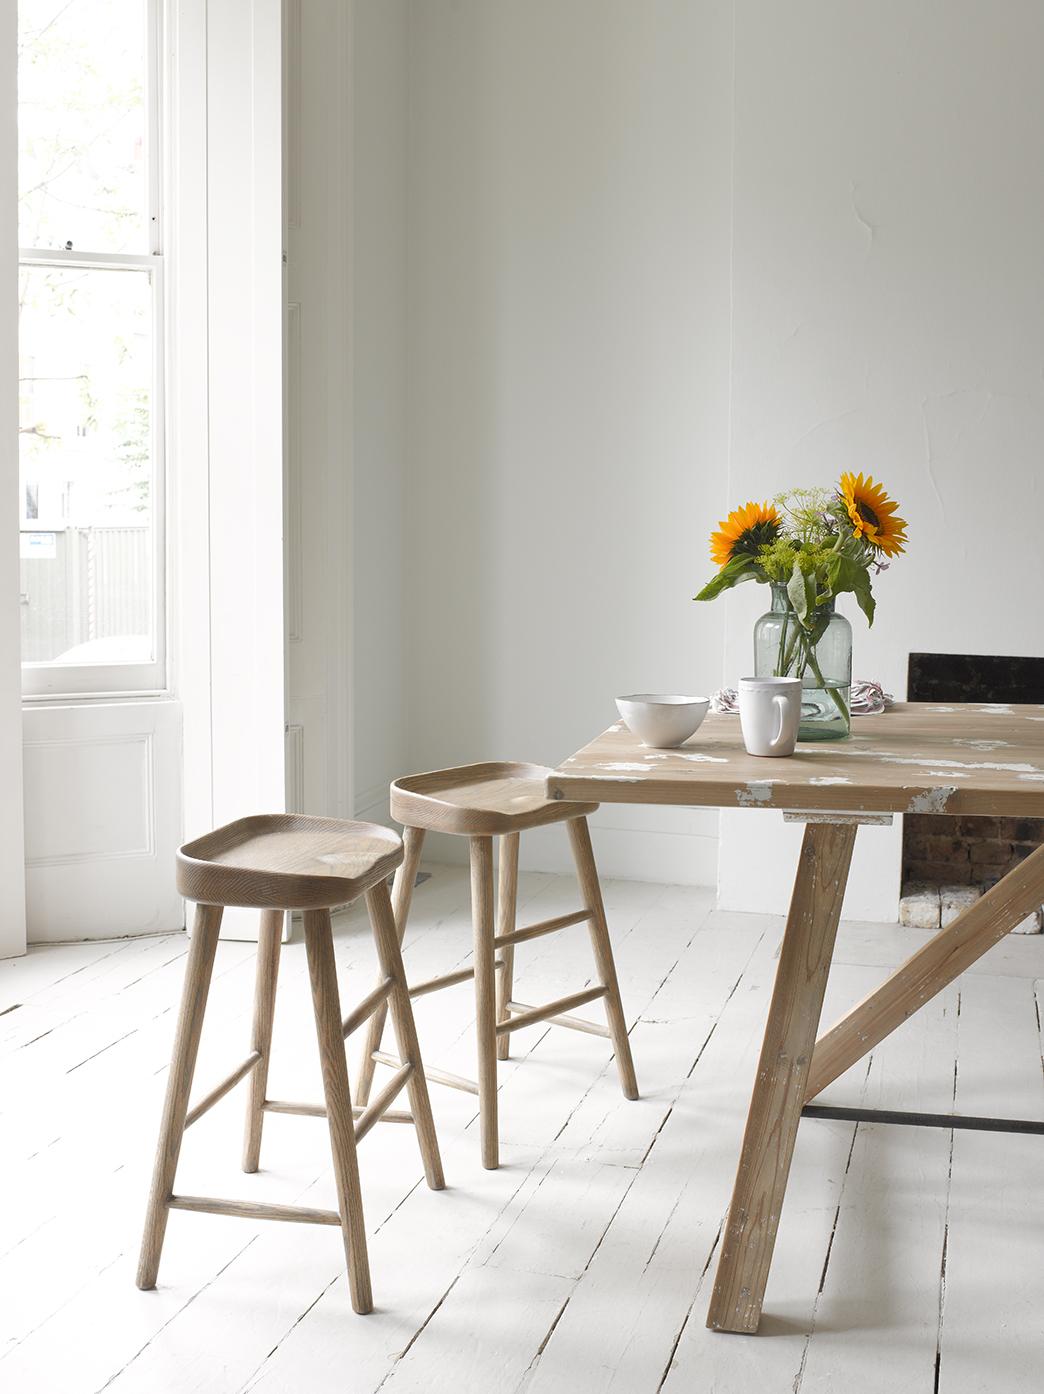 Pair of Bumble stools